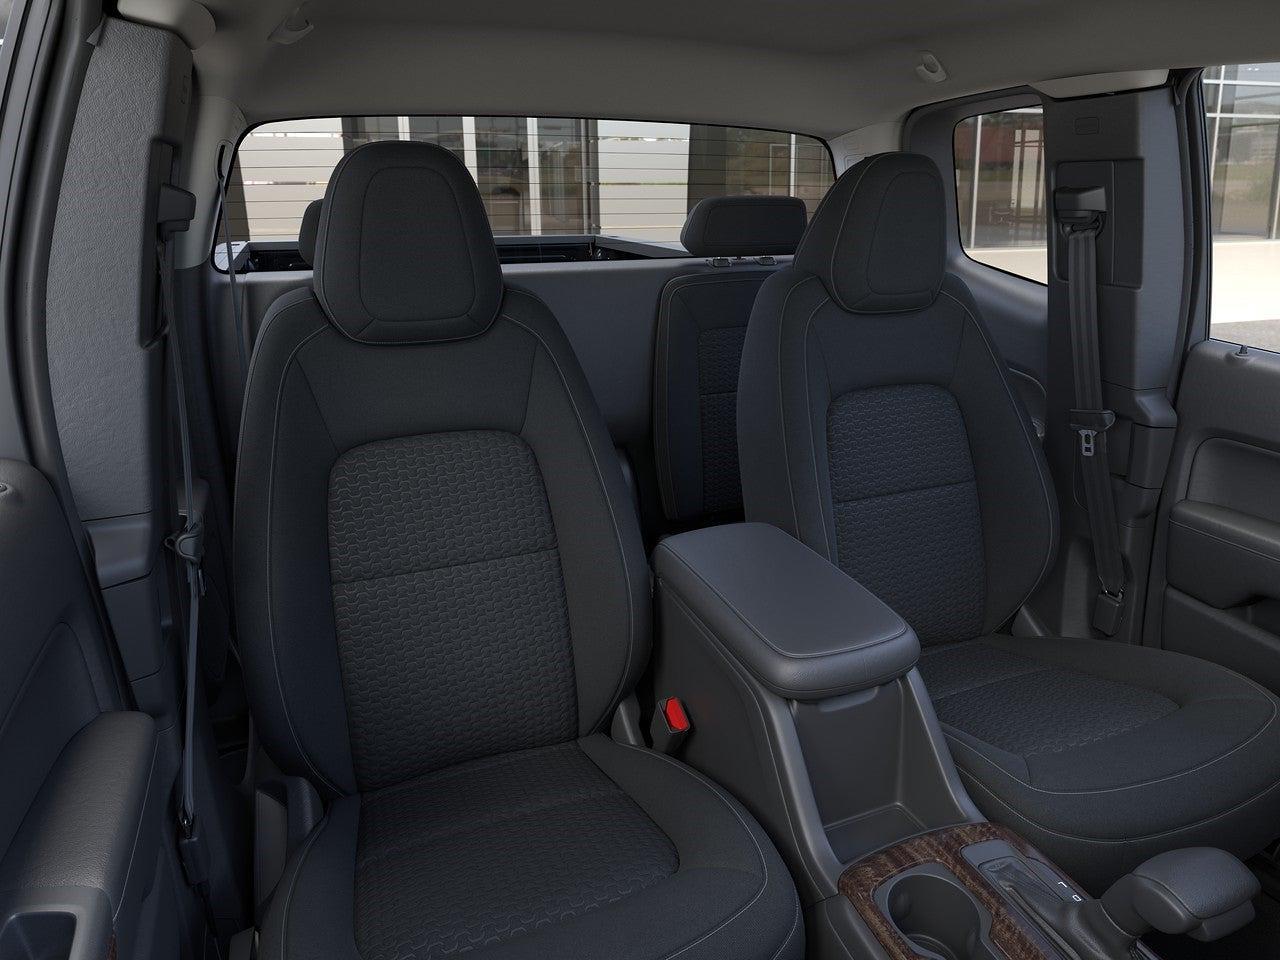 2020 GMC Canyon Extended Cab 4x2, Pickup #V20410 - photo 7